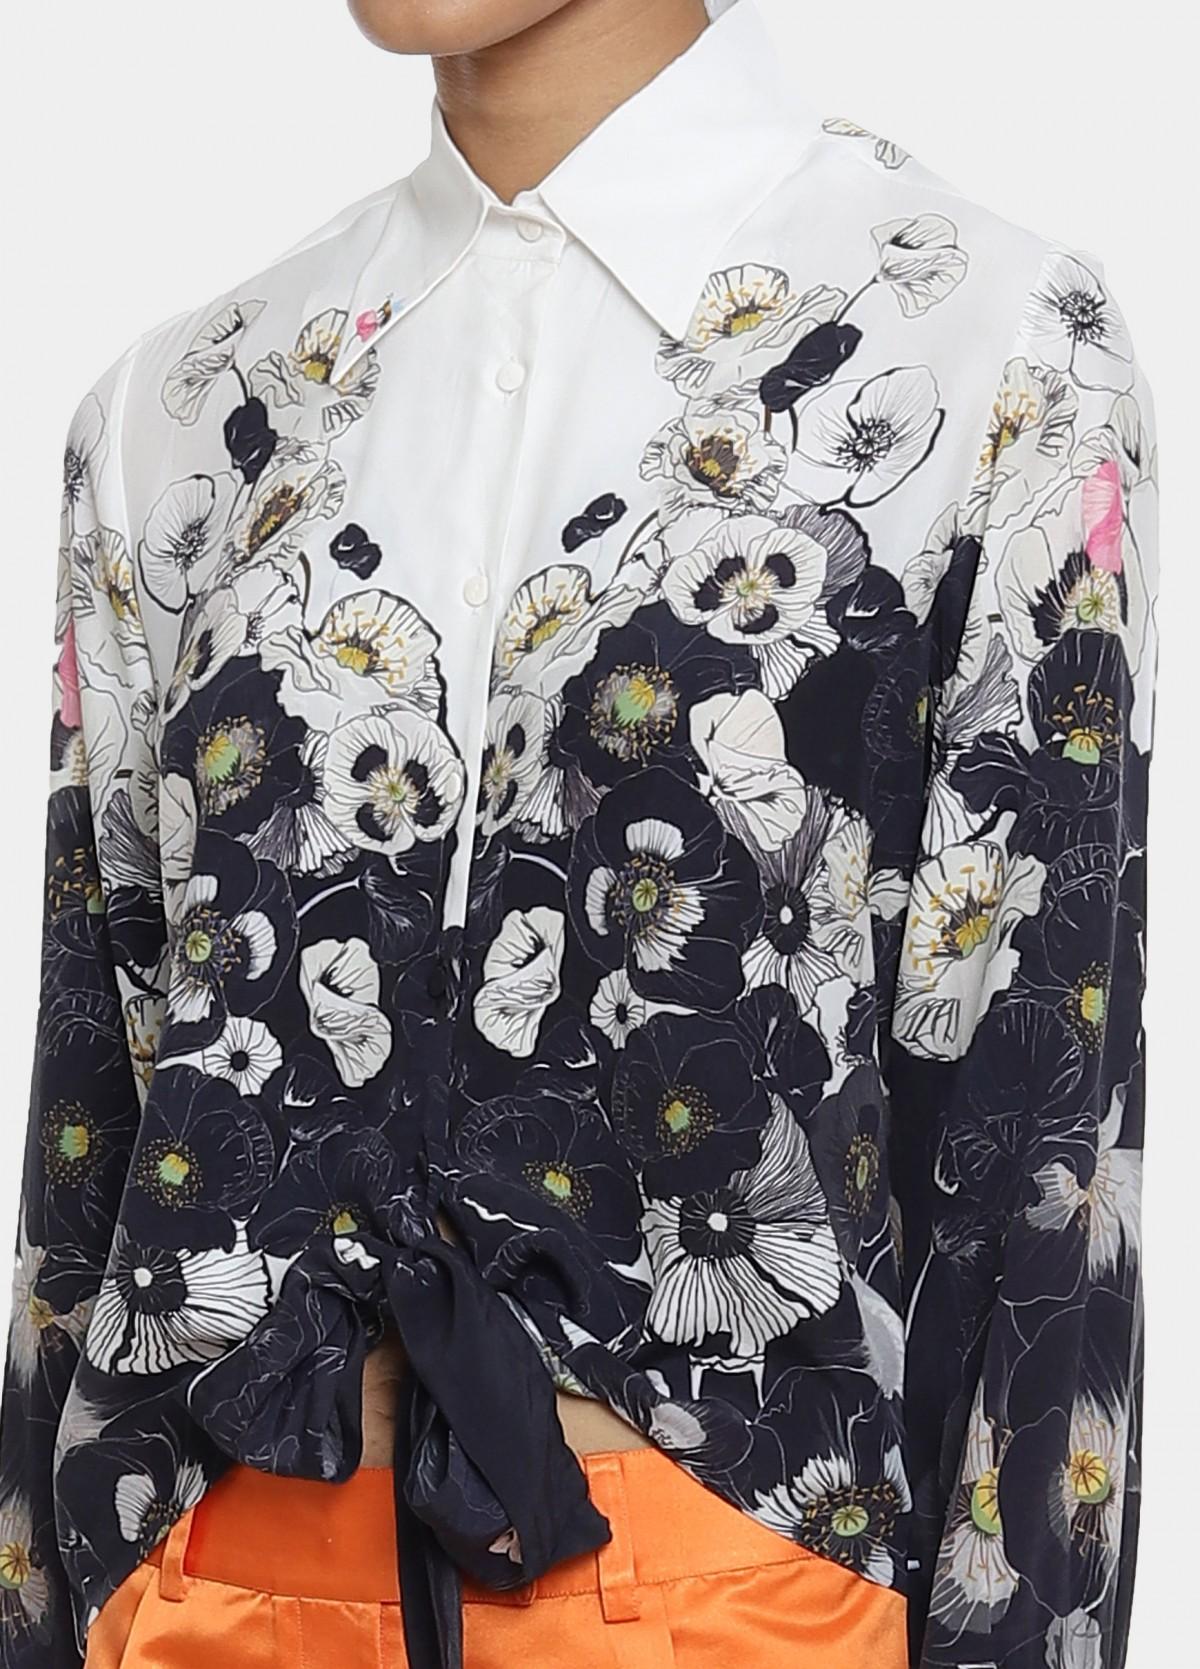 The Peggy Shirt